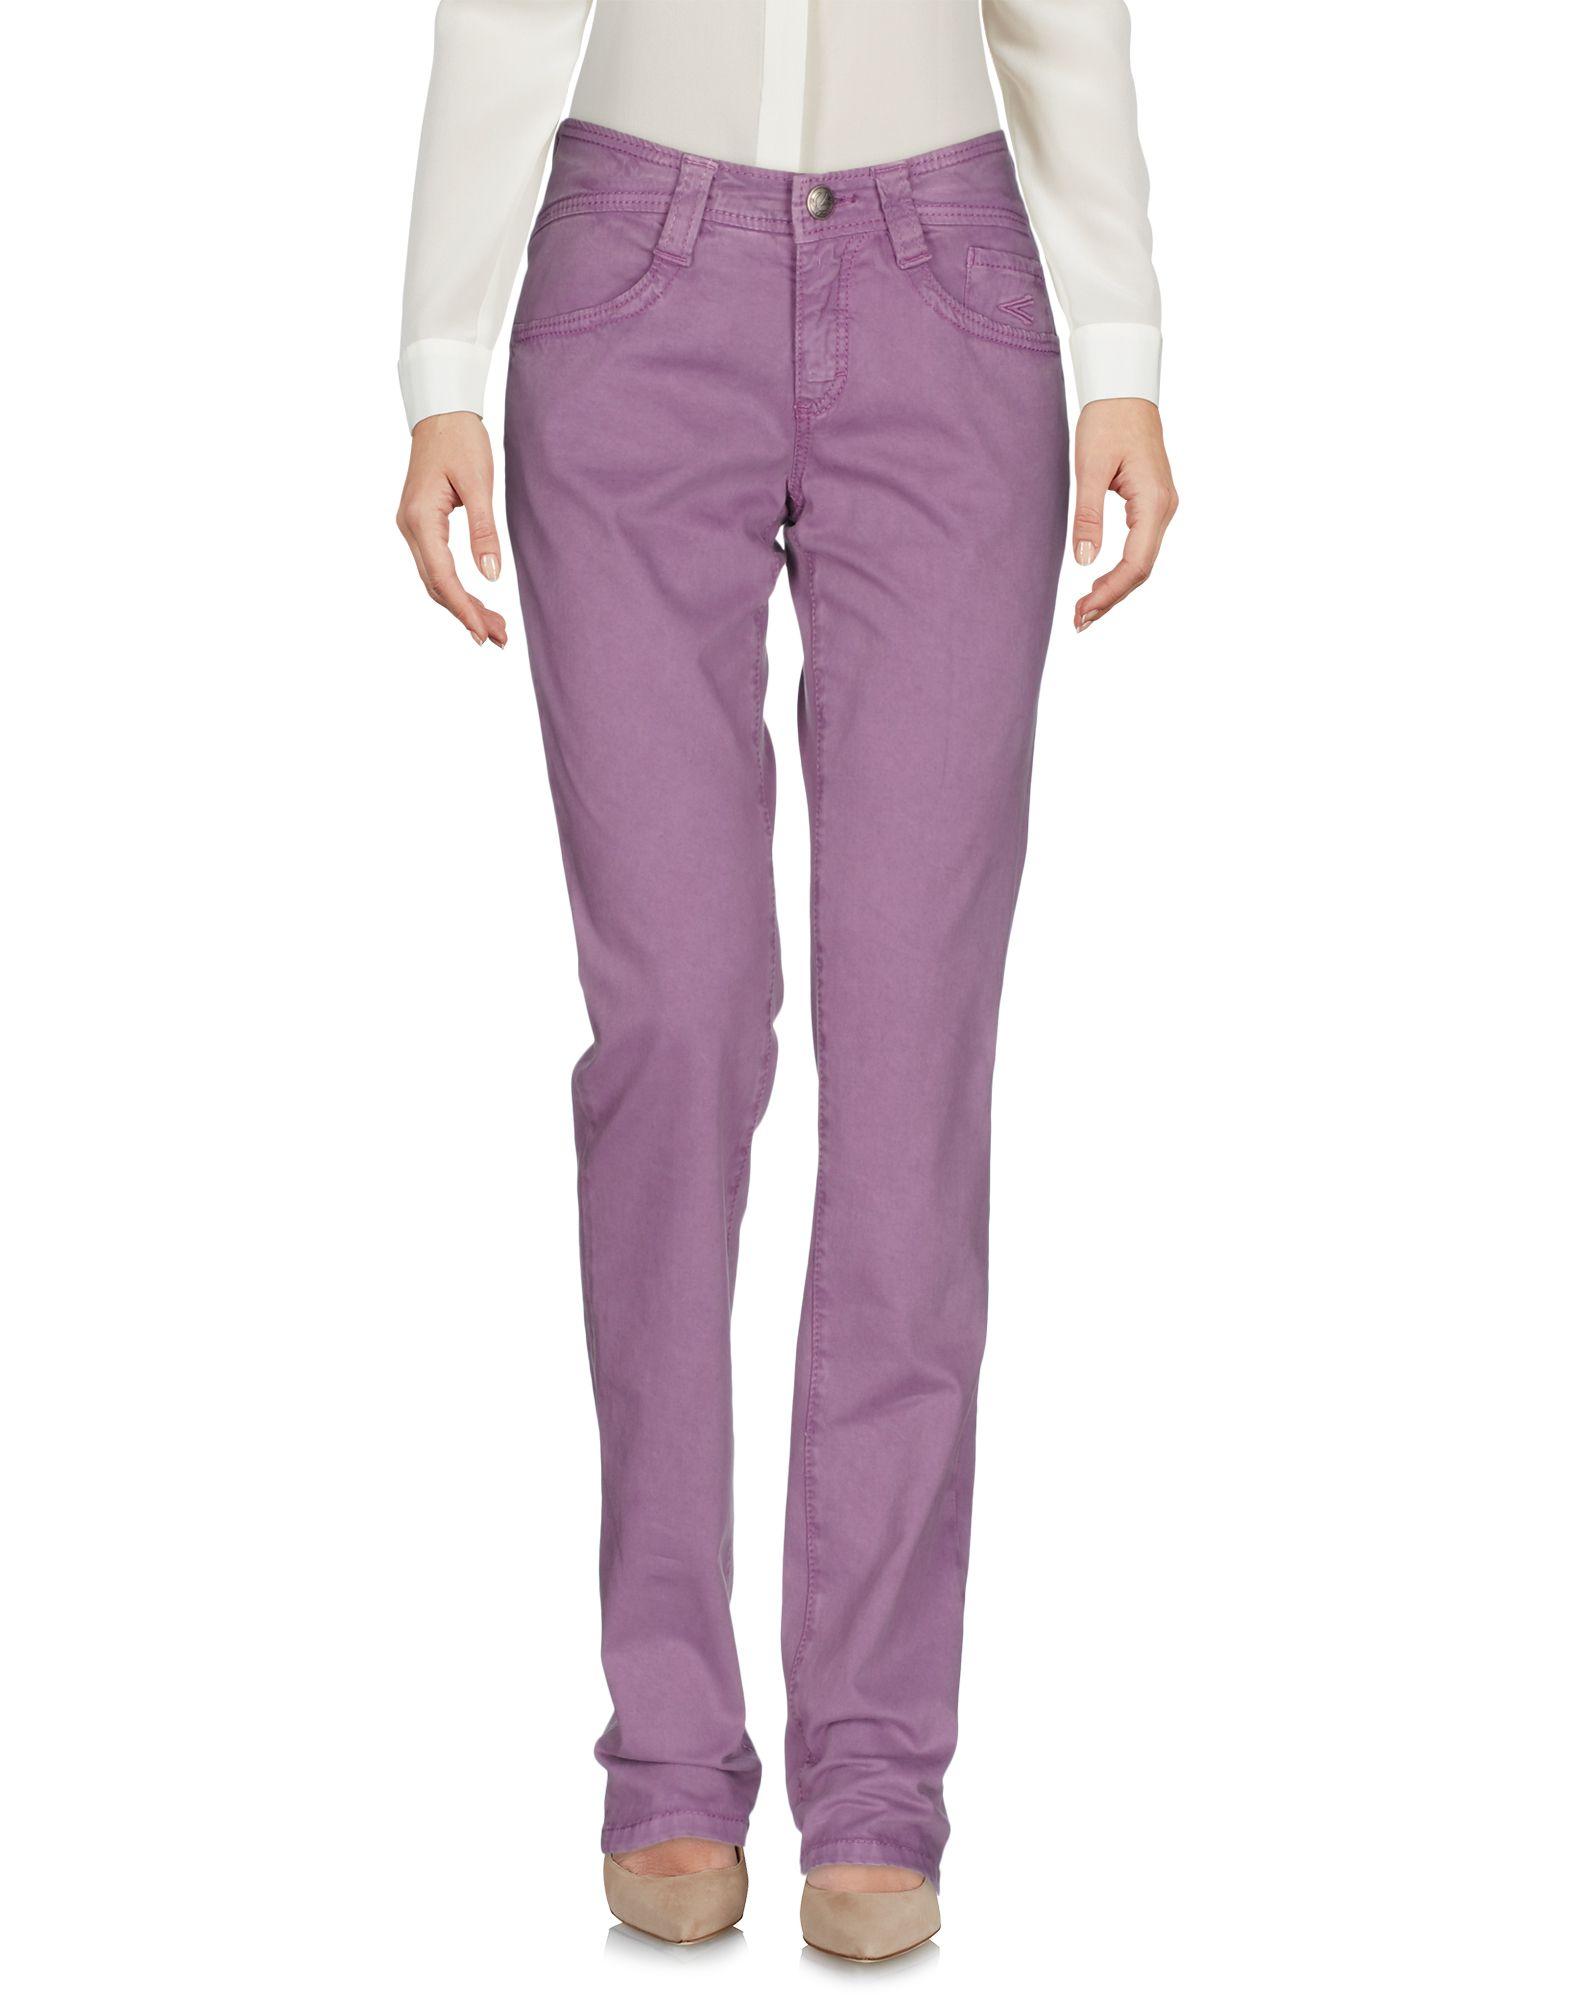 CARLO CHIONNA Damen Hose Farbe Lila Größe 7 jetztbilligerkaufen